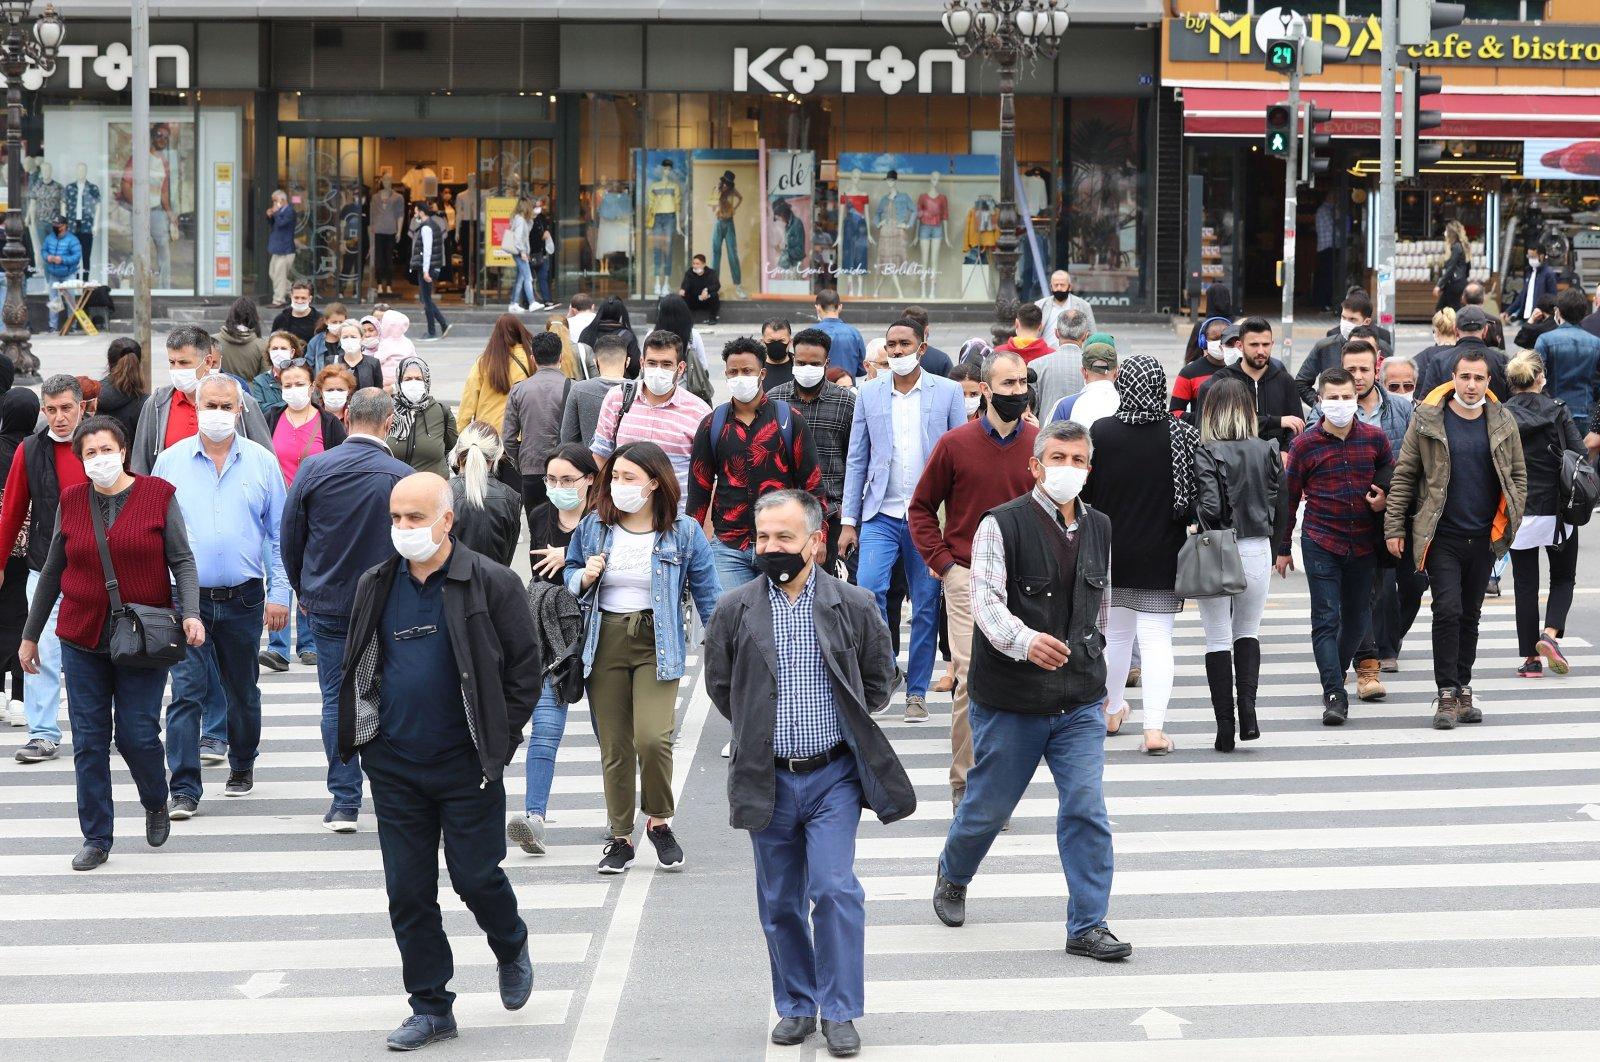 People wearing protective face masks during the coronavirus outbreak walk on a street in Ankara, Turkey, June 1, 2020. (AFP Photo)